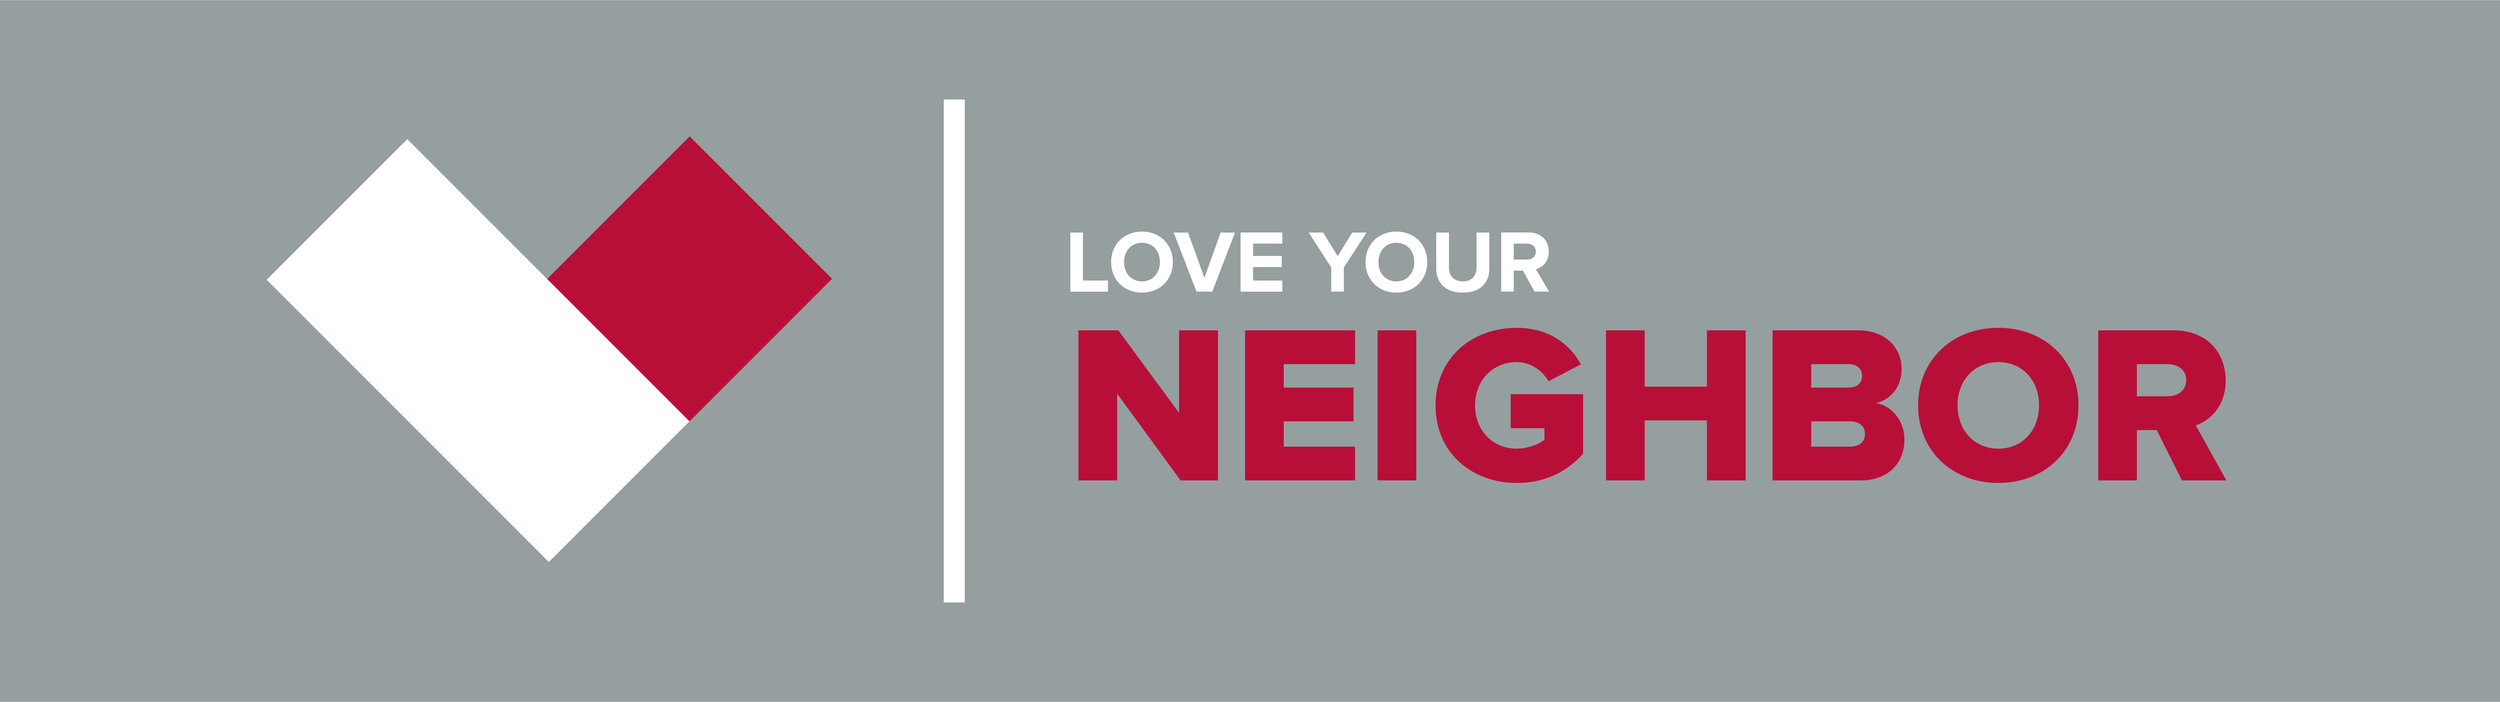 Love Your Neighbor_sit__Title_Blue copy 2.jpg